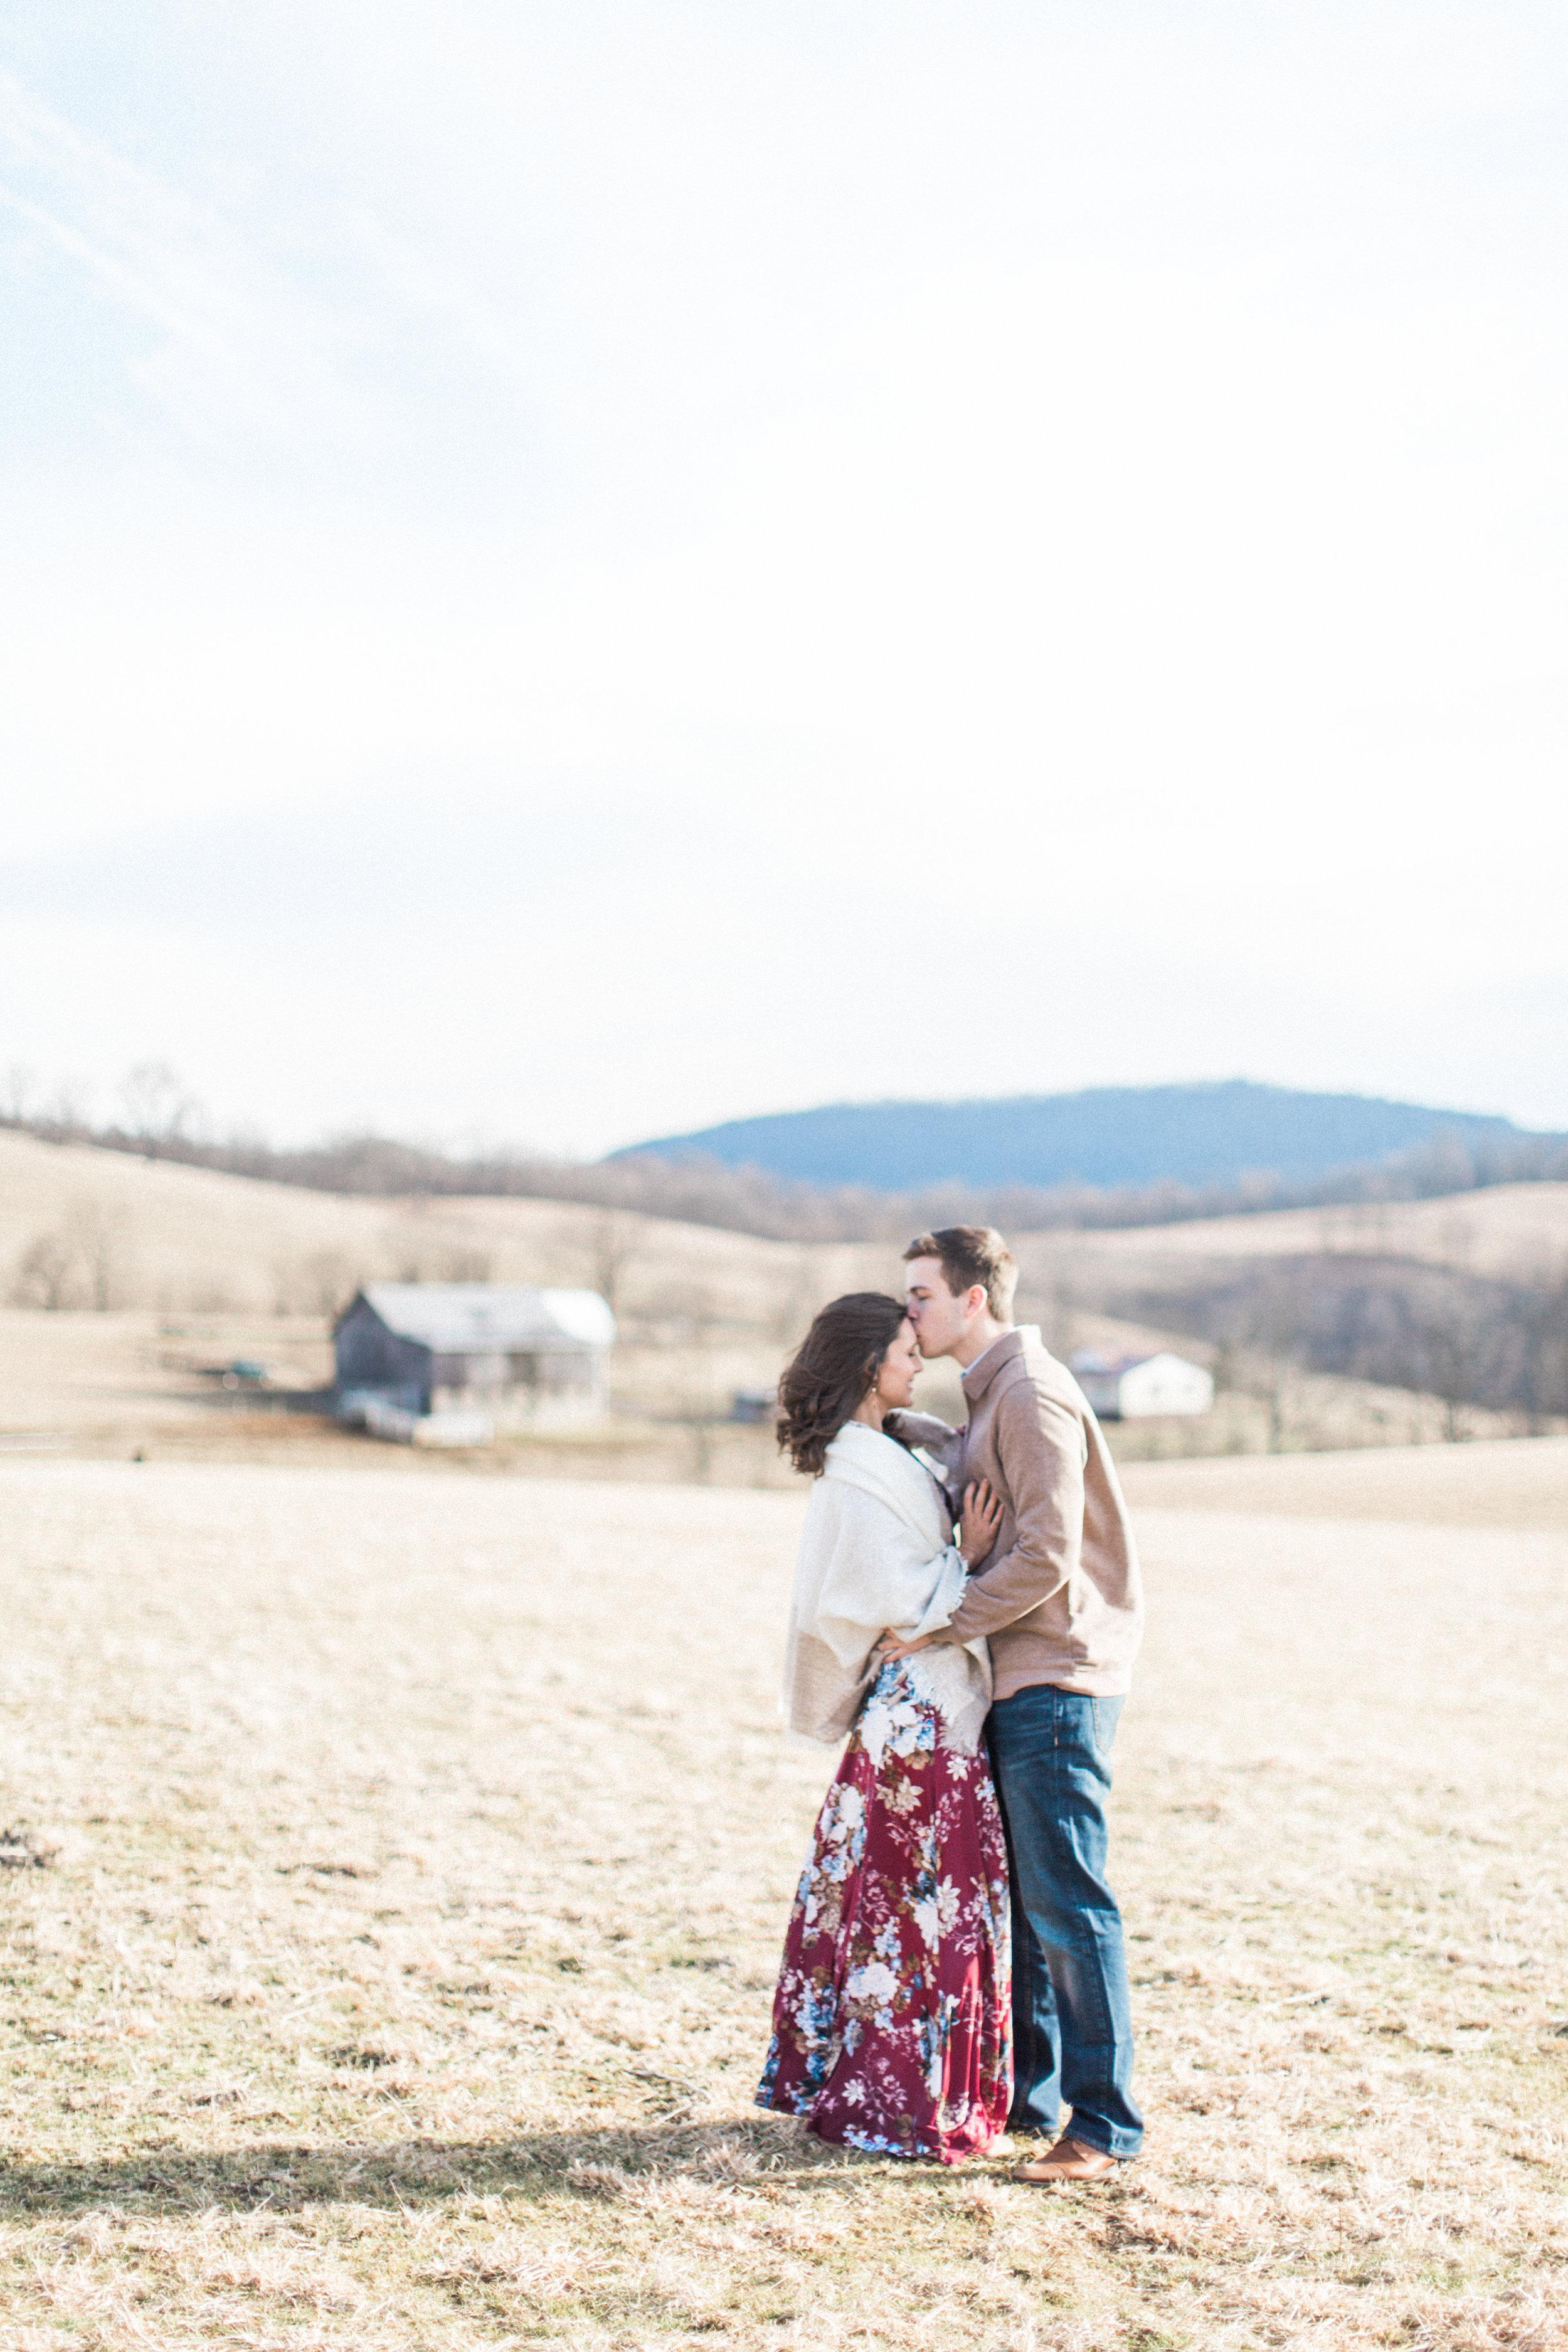 Abigail_Jill_Photography_Maryland_Engagement_Farm_Emily_Justin199.jpg